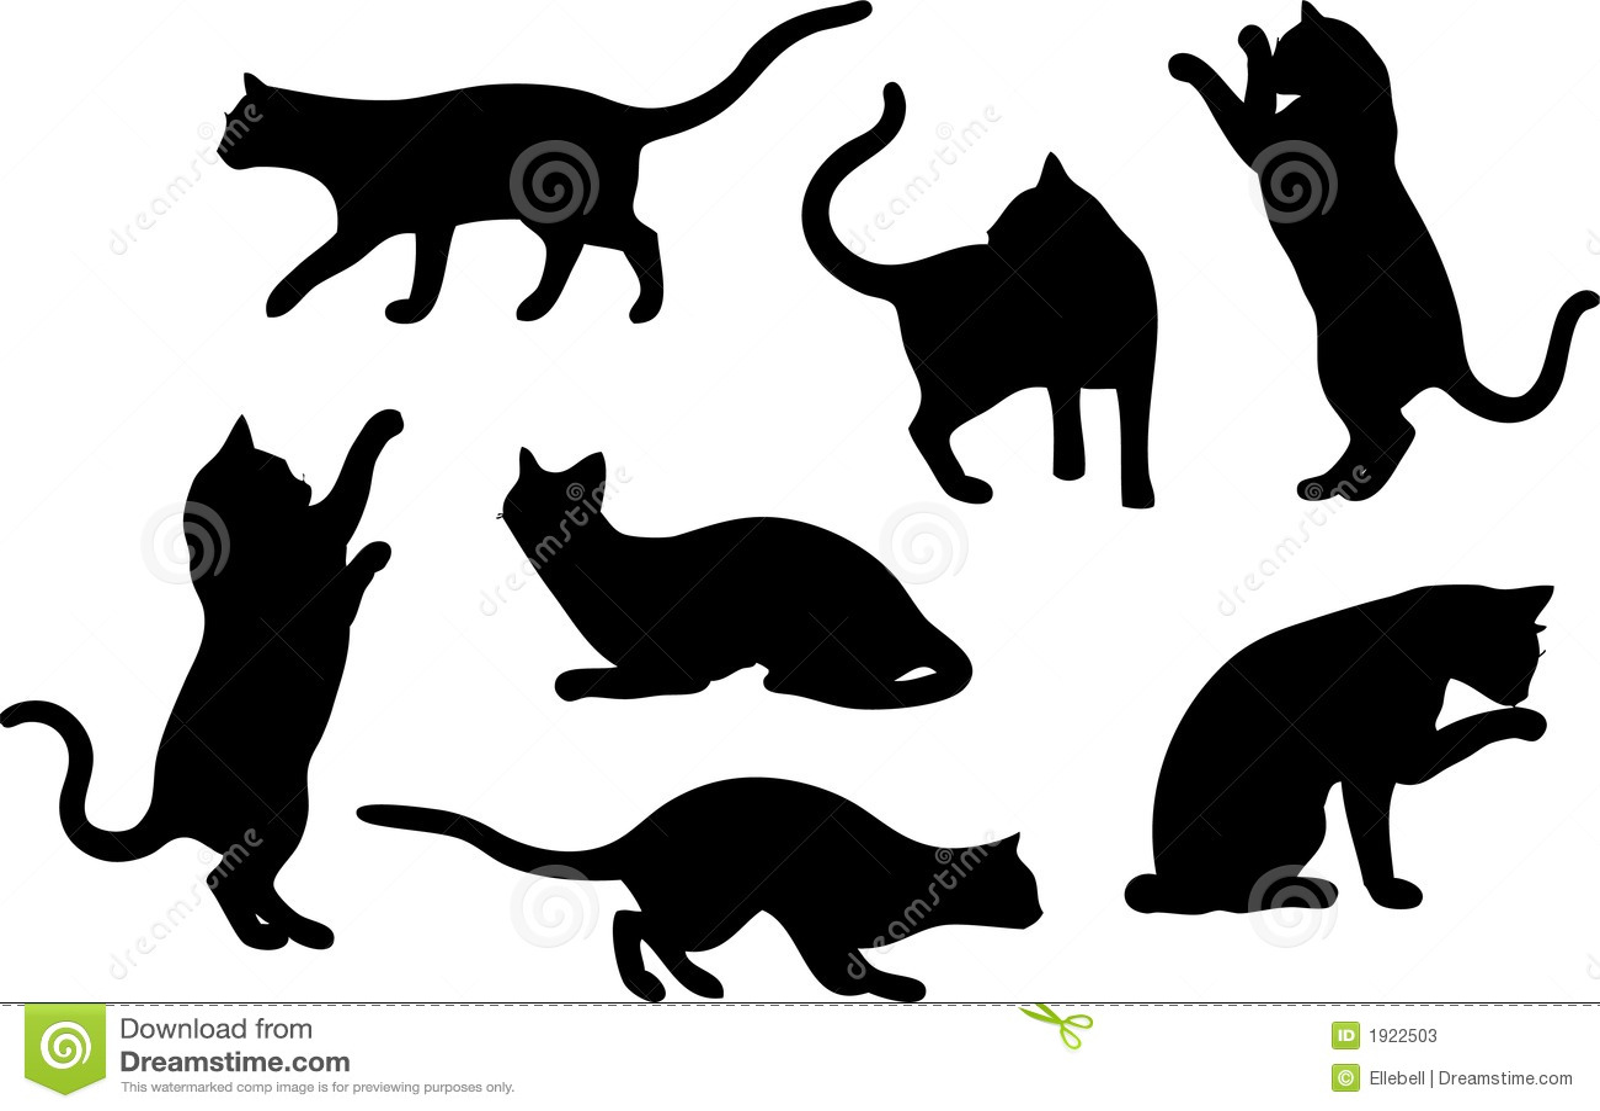 Set Katze-Schattenbilder Stockfotos - Bild: 1922503